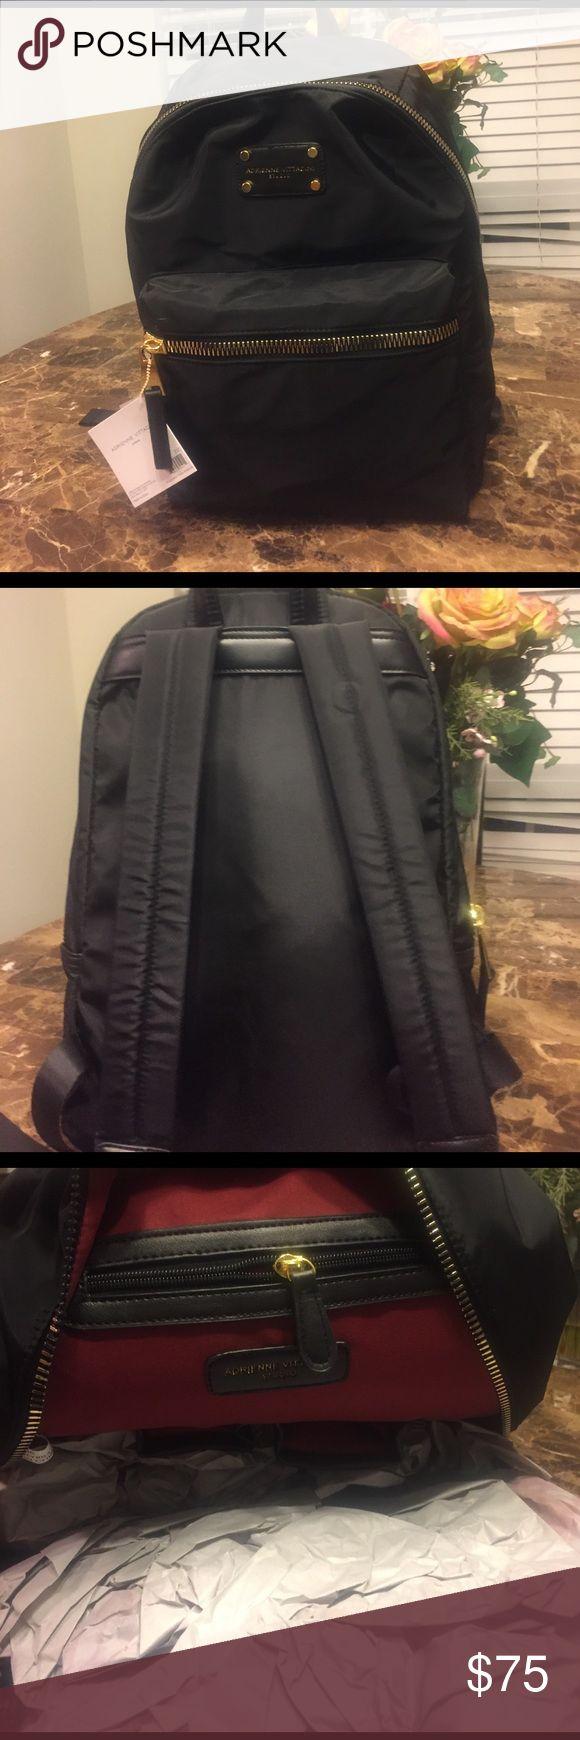 Adrienne Vittadini nylon fashion back pack. Adrienne Vittadini nylon fashion back pack. Super classy! Adrienne Vittadini Bags Backpacks